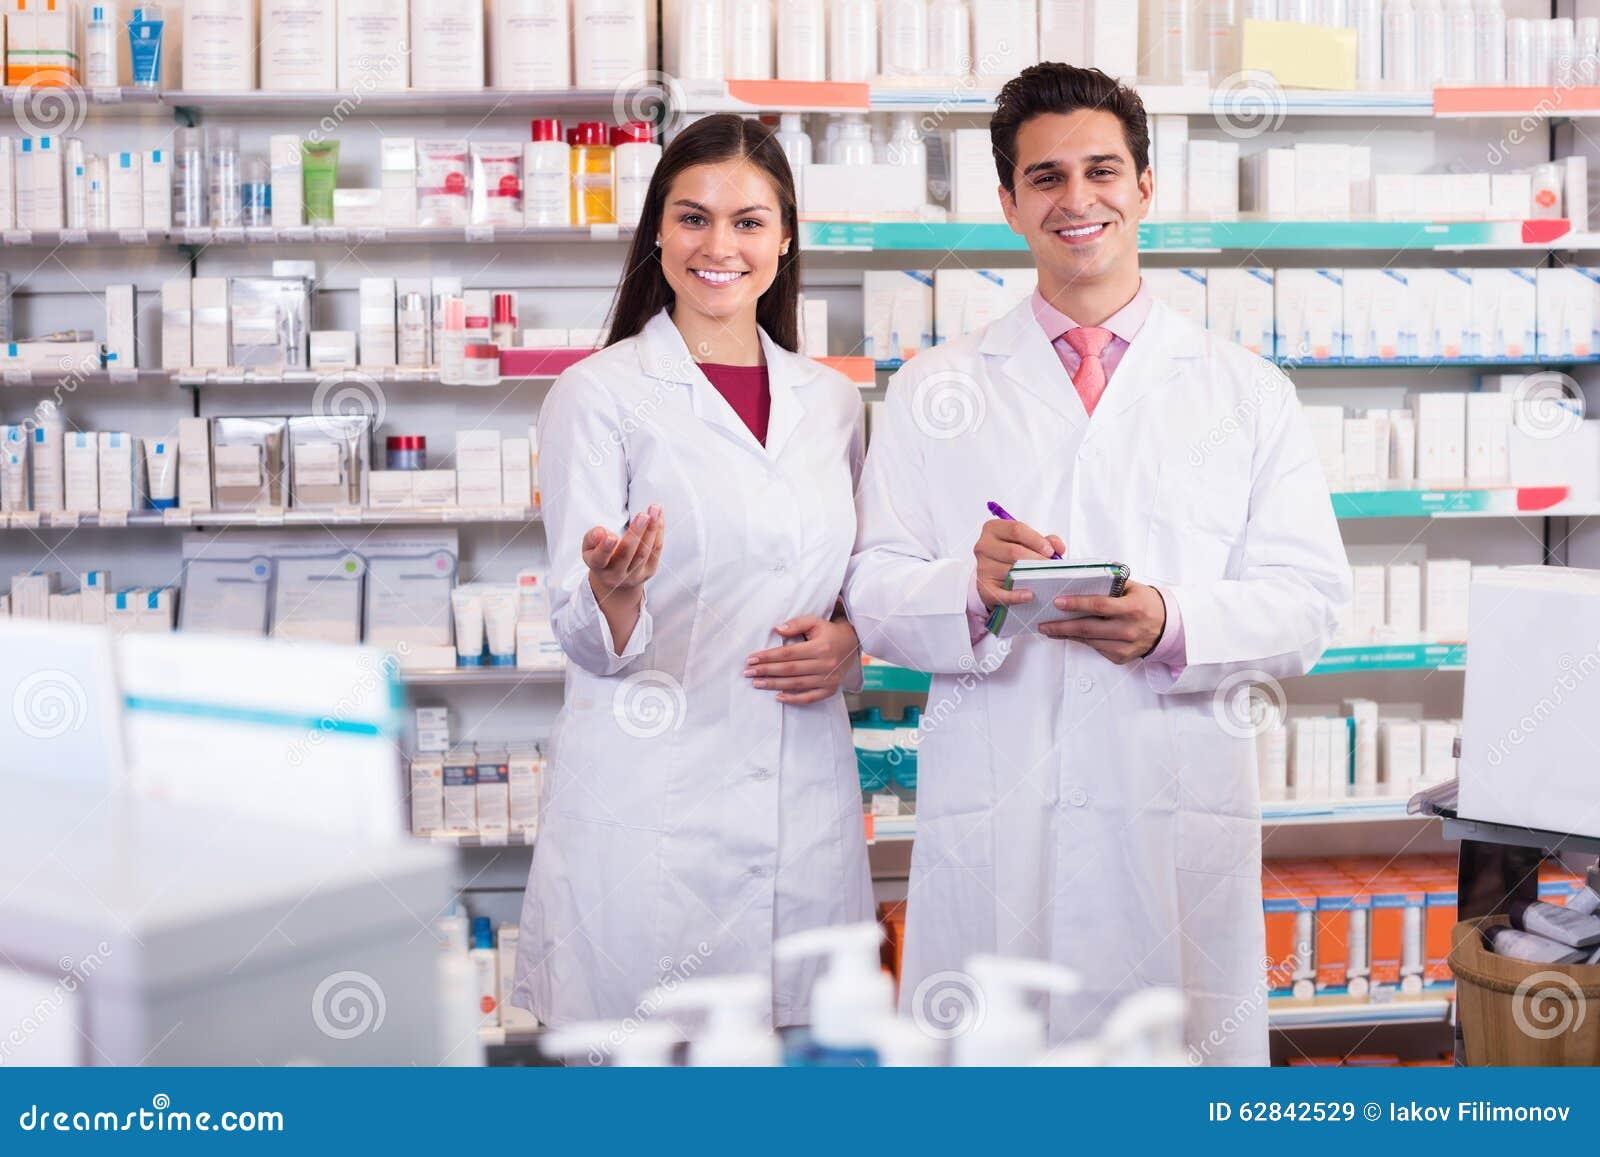 Pharmacist and pharmacy technician working